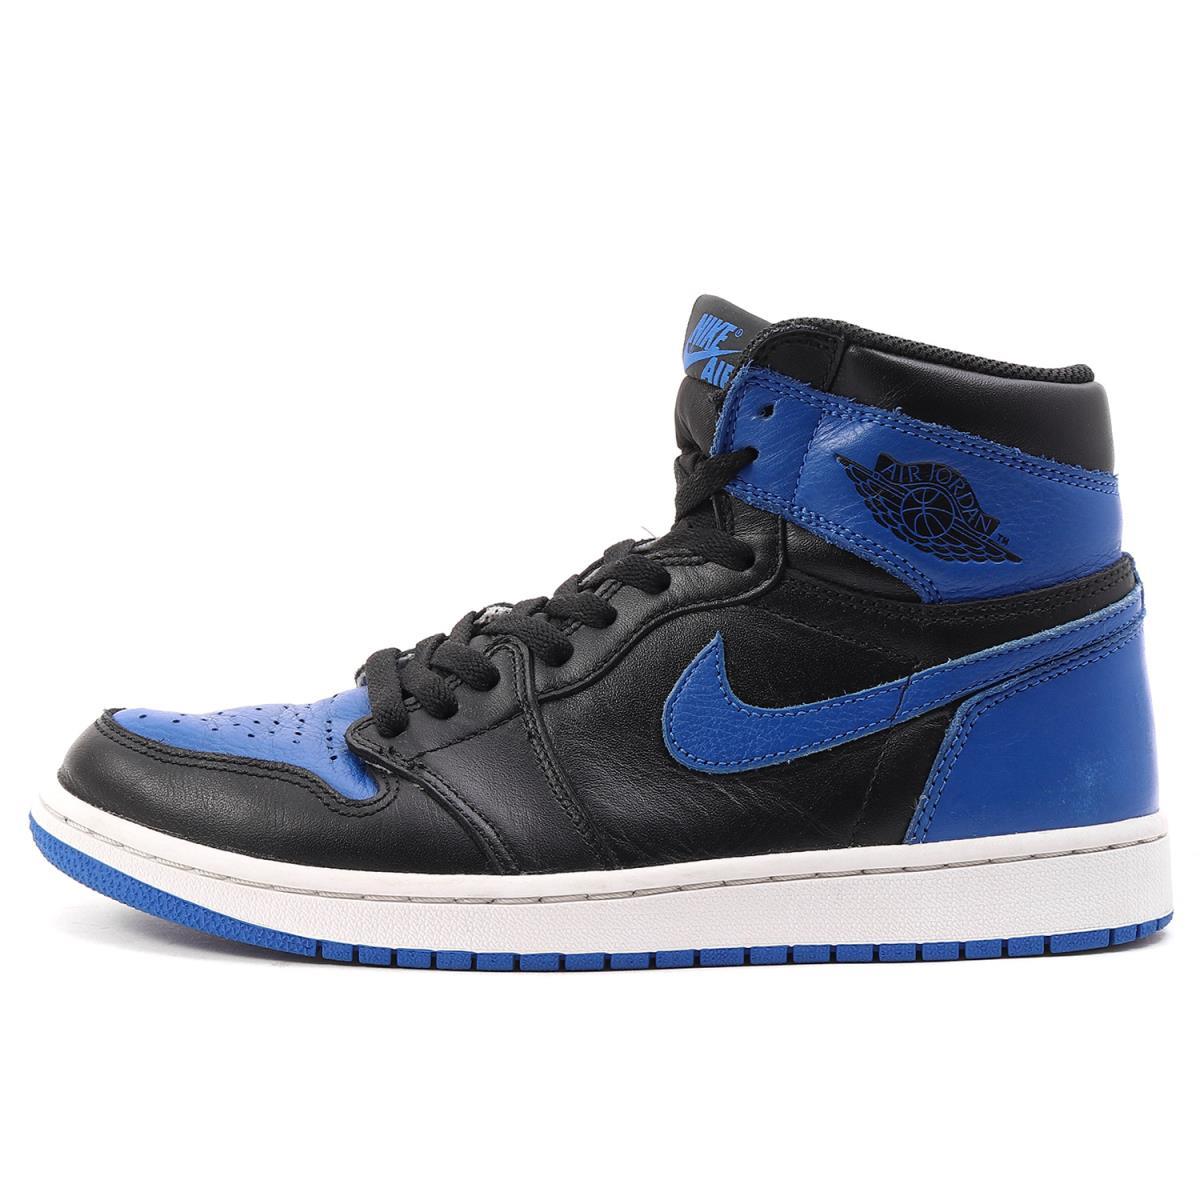 wholesale sales nice shoes on sale NIKE (Nike) AIR JORDAN 1 RETRO HIGH OG ROYAL (/ 555,088-007 made in 2017)  black X royal US8.5(26.5cm)